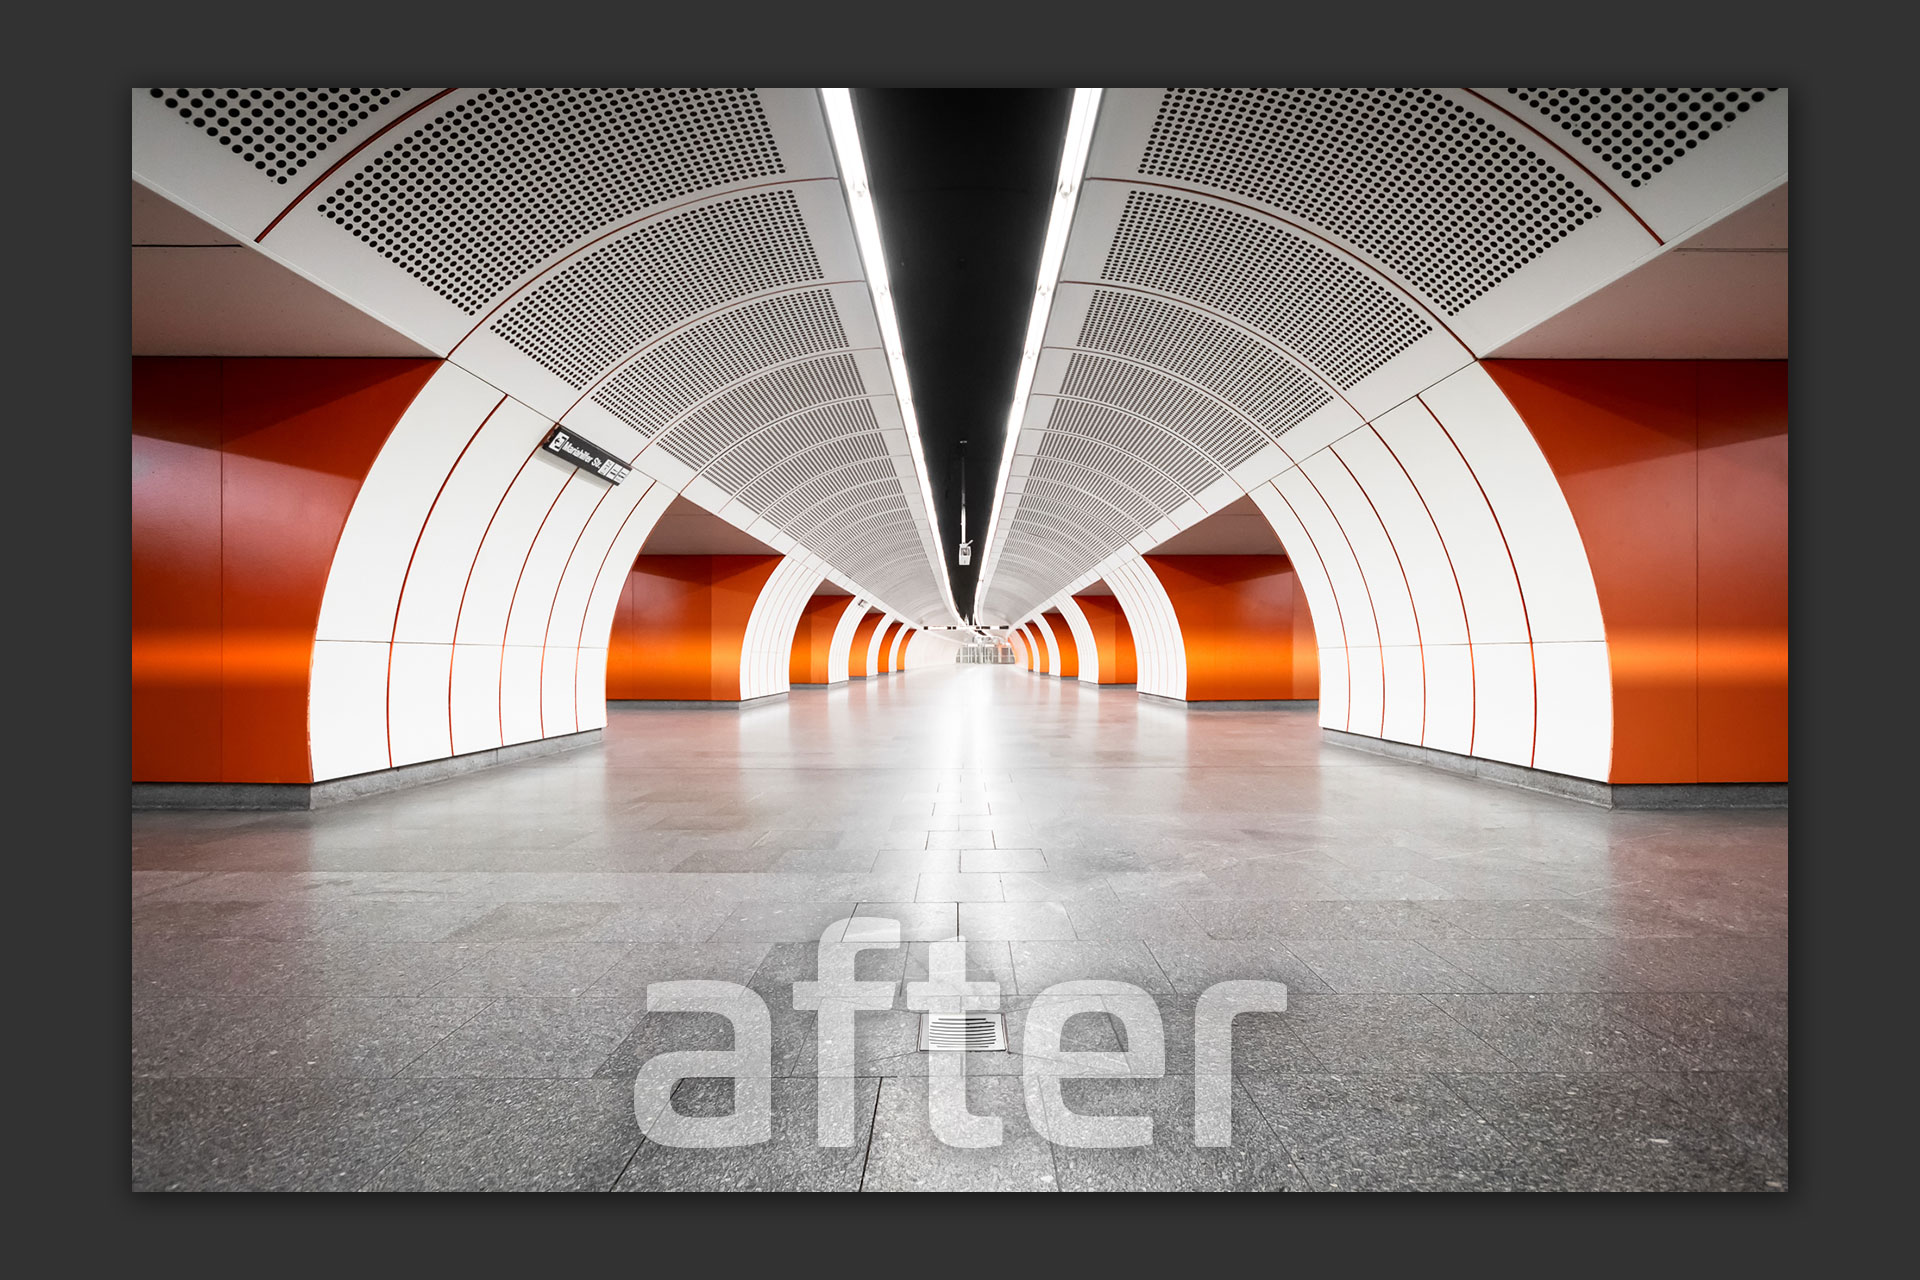 2-after.jpg